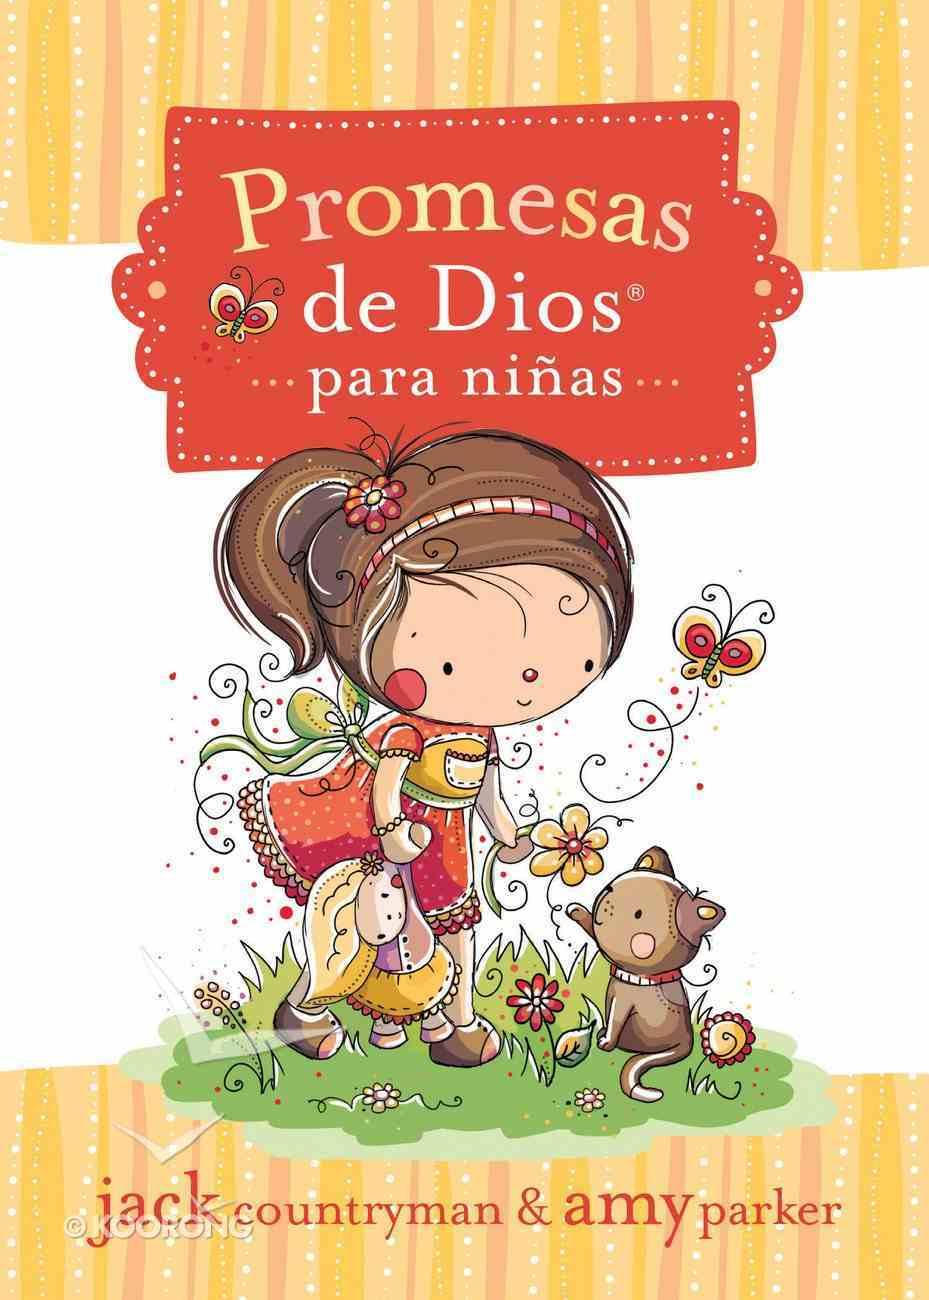 Promesas De Dios Para Ninas (Spanish) (Spa) (God's Promises For Girls) eBook